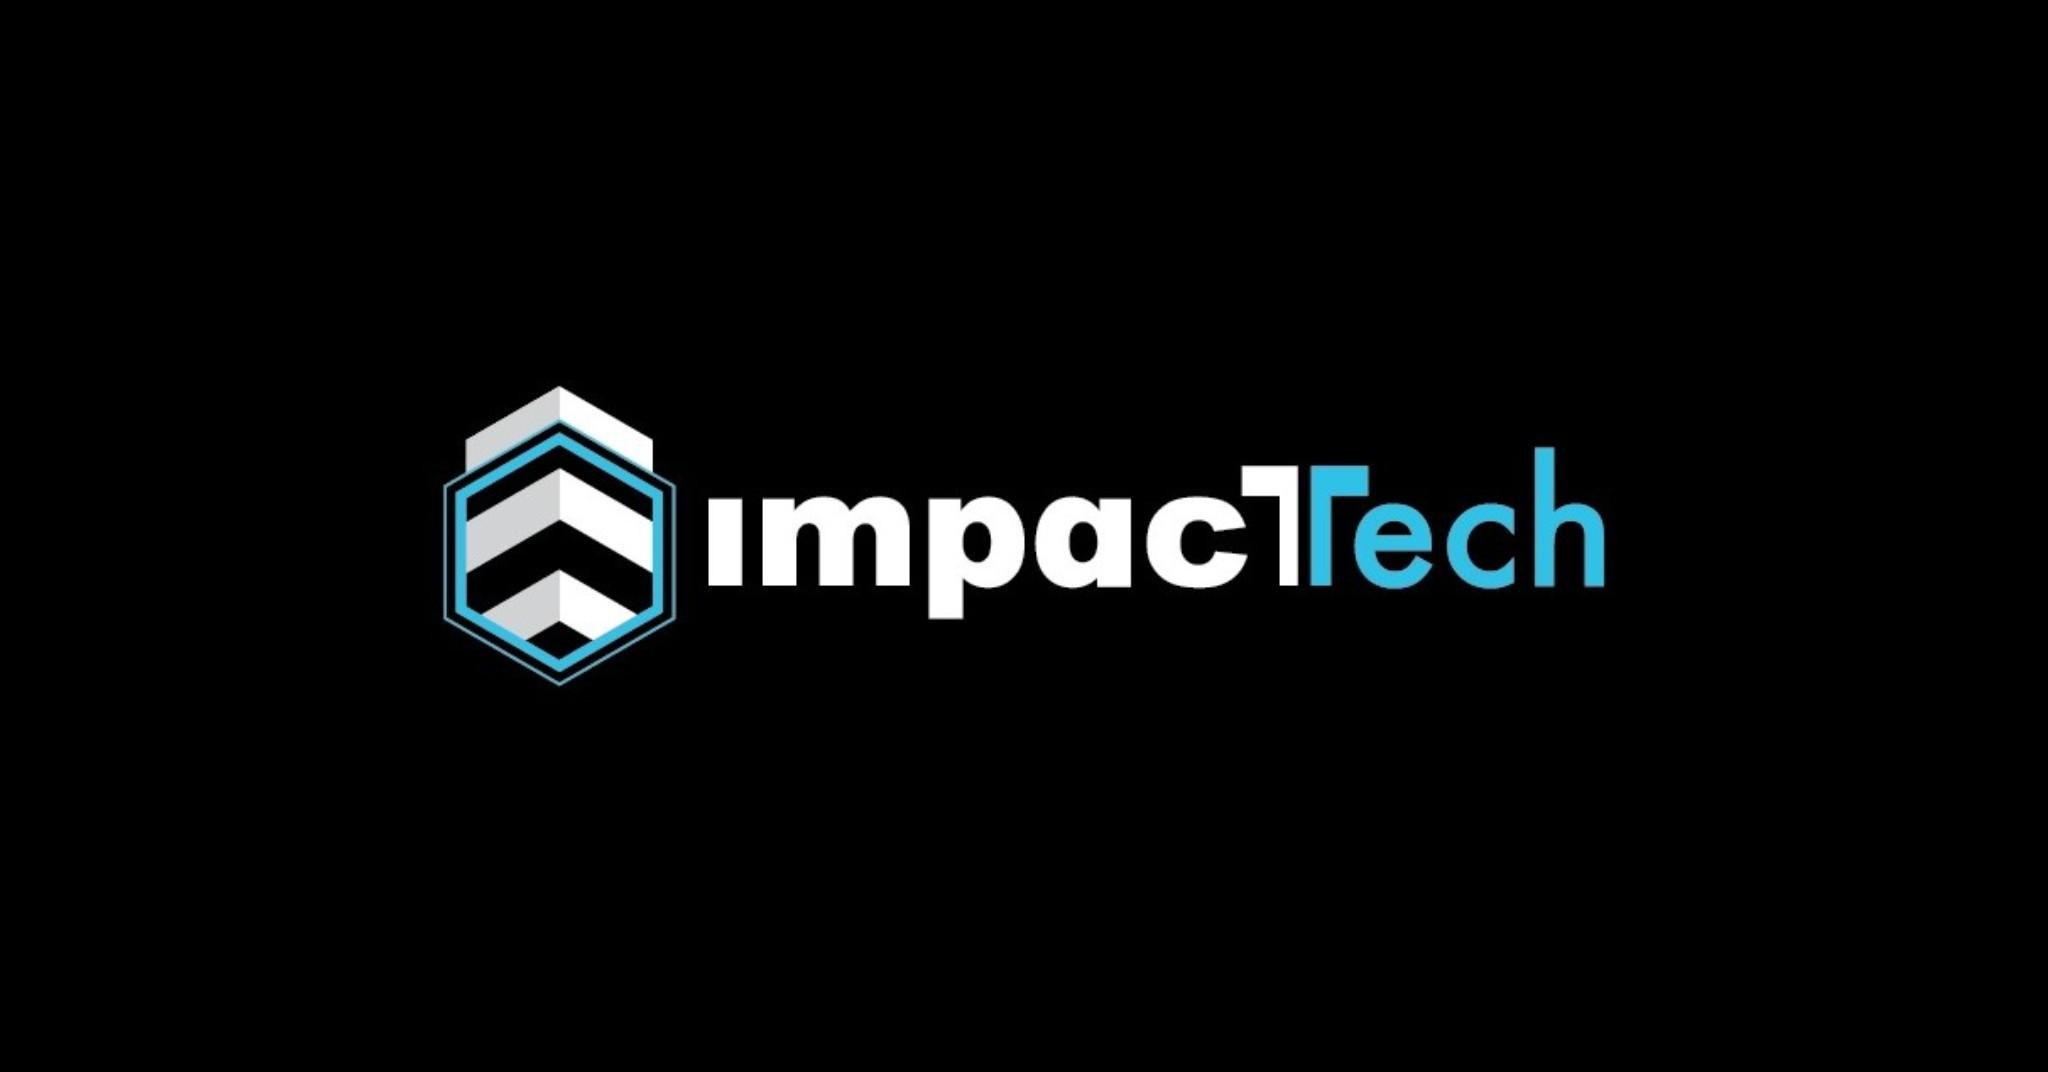 ImpacTech